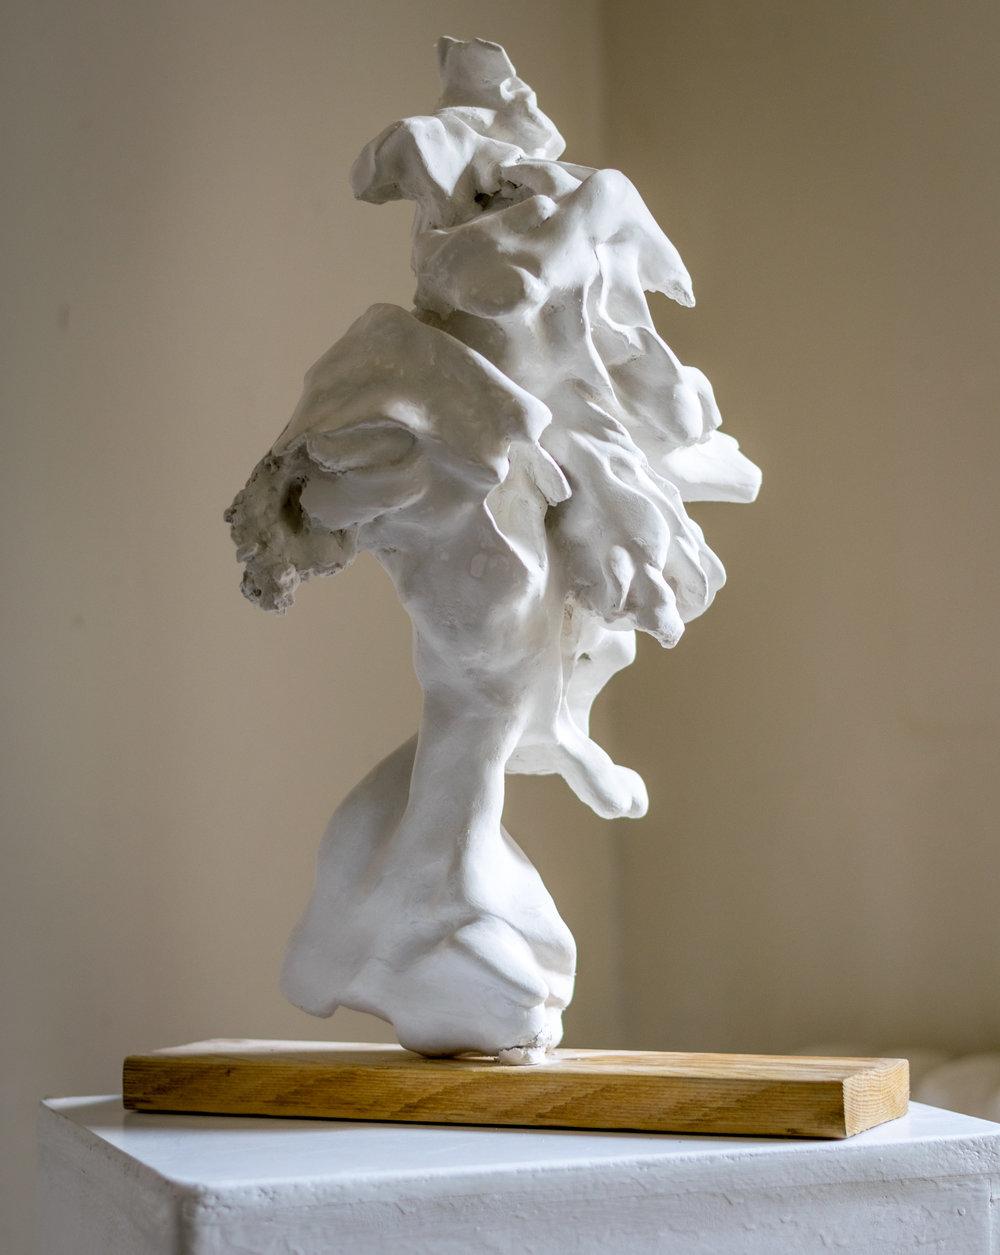 Orpheus - A Jean-Pierre Loeb